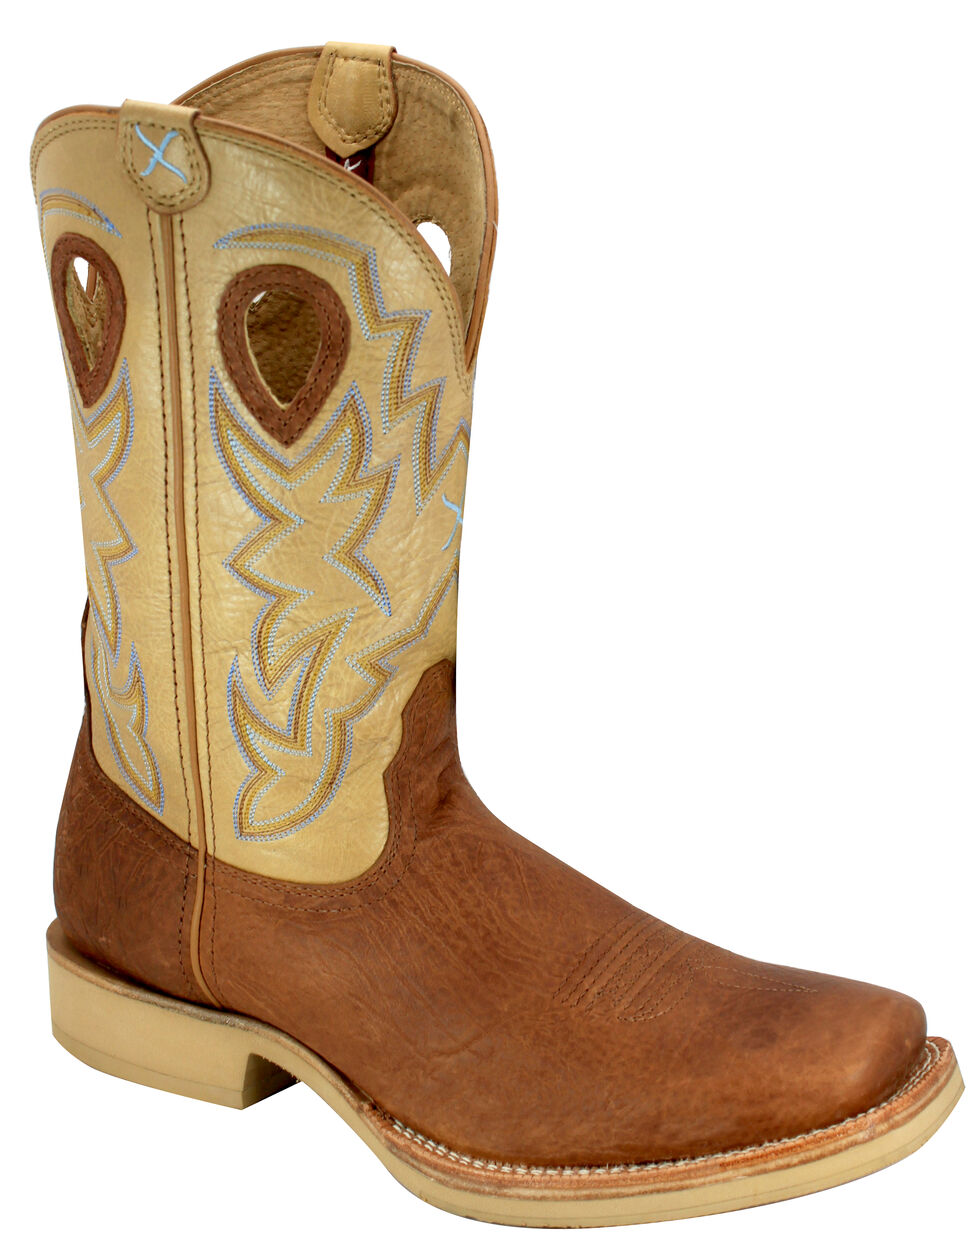 Twisted X Tan and Brown Horseman Cowboy Boots - Square Toe, Brown, hi-res